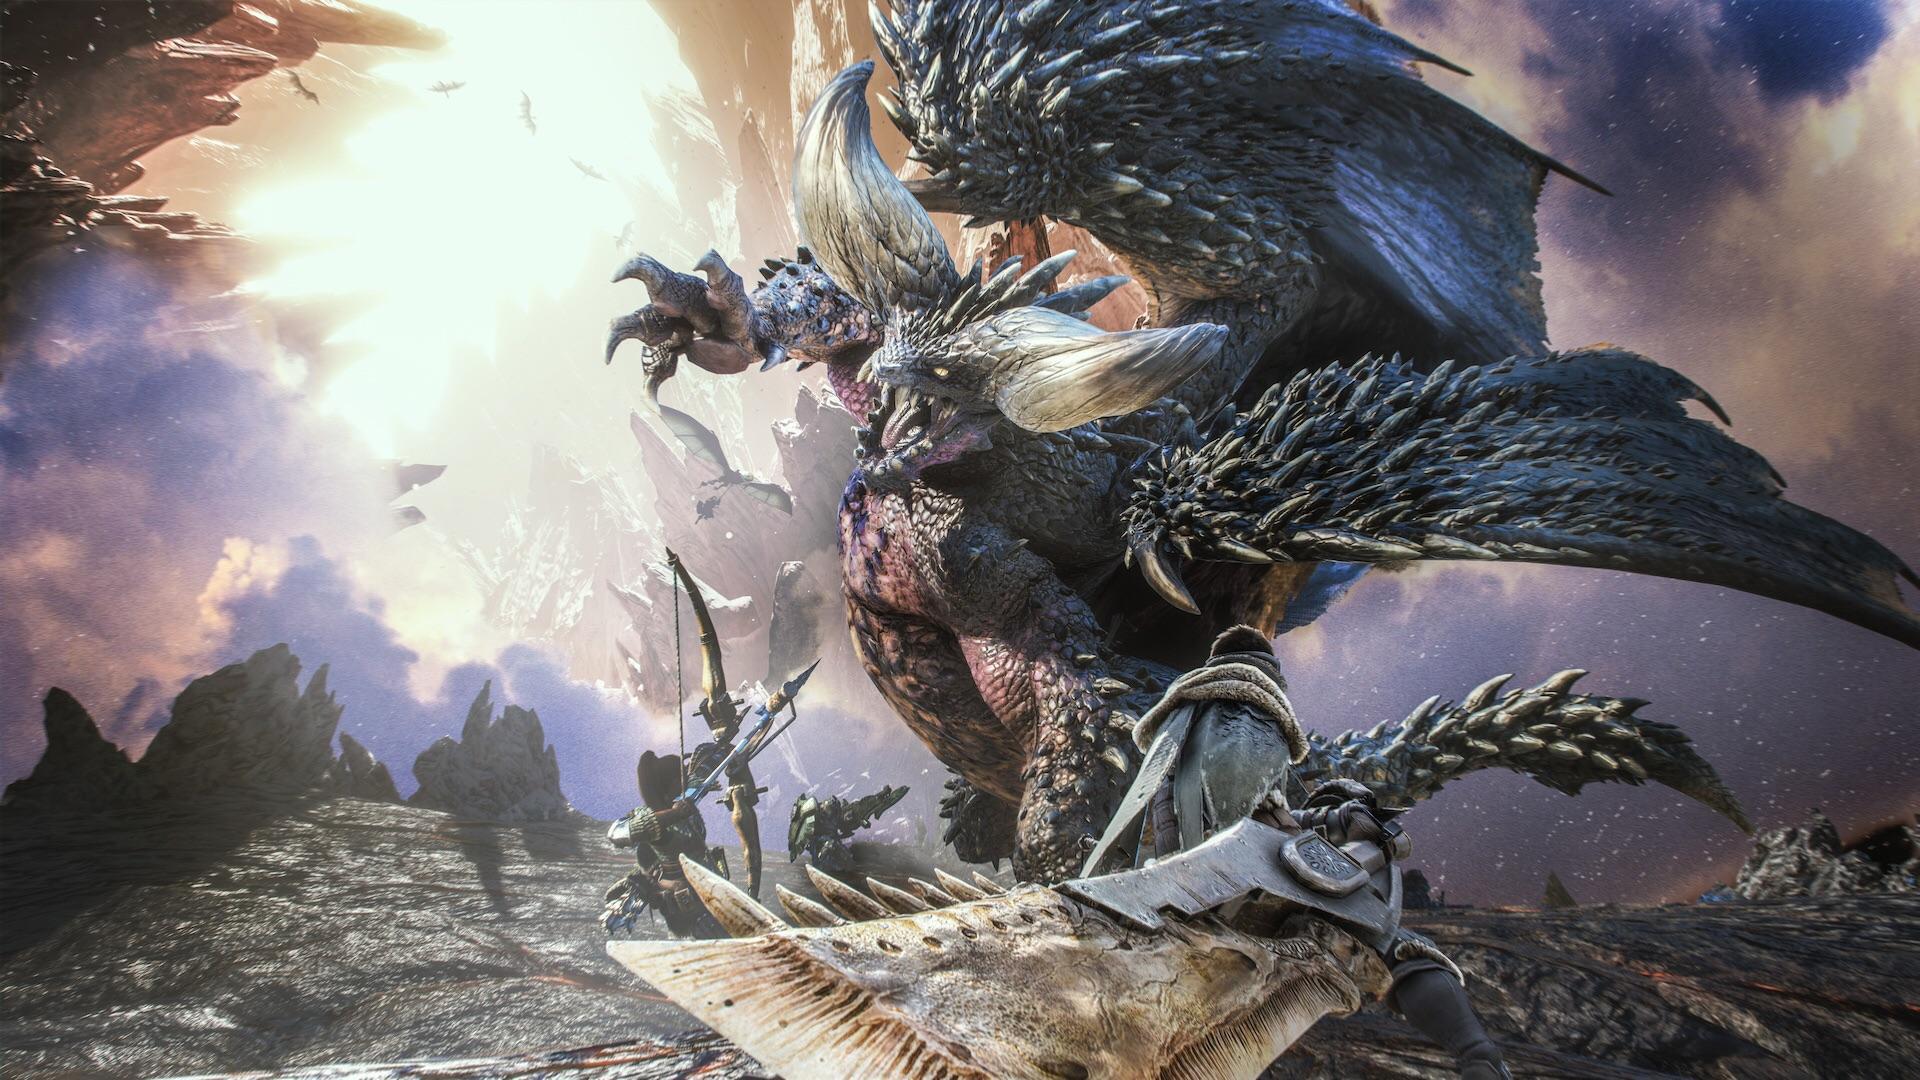 Хакеры взломали Monster Hunter: World. Denuvo успешно «держала оборону» почти 4 месяца